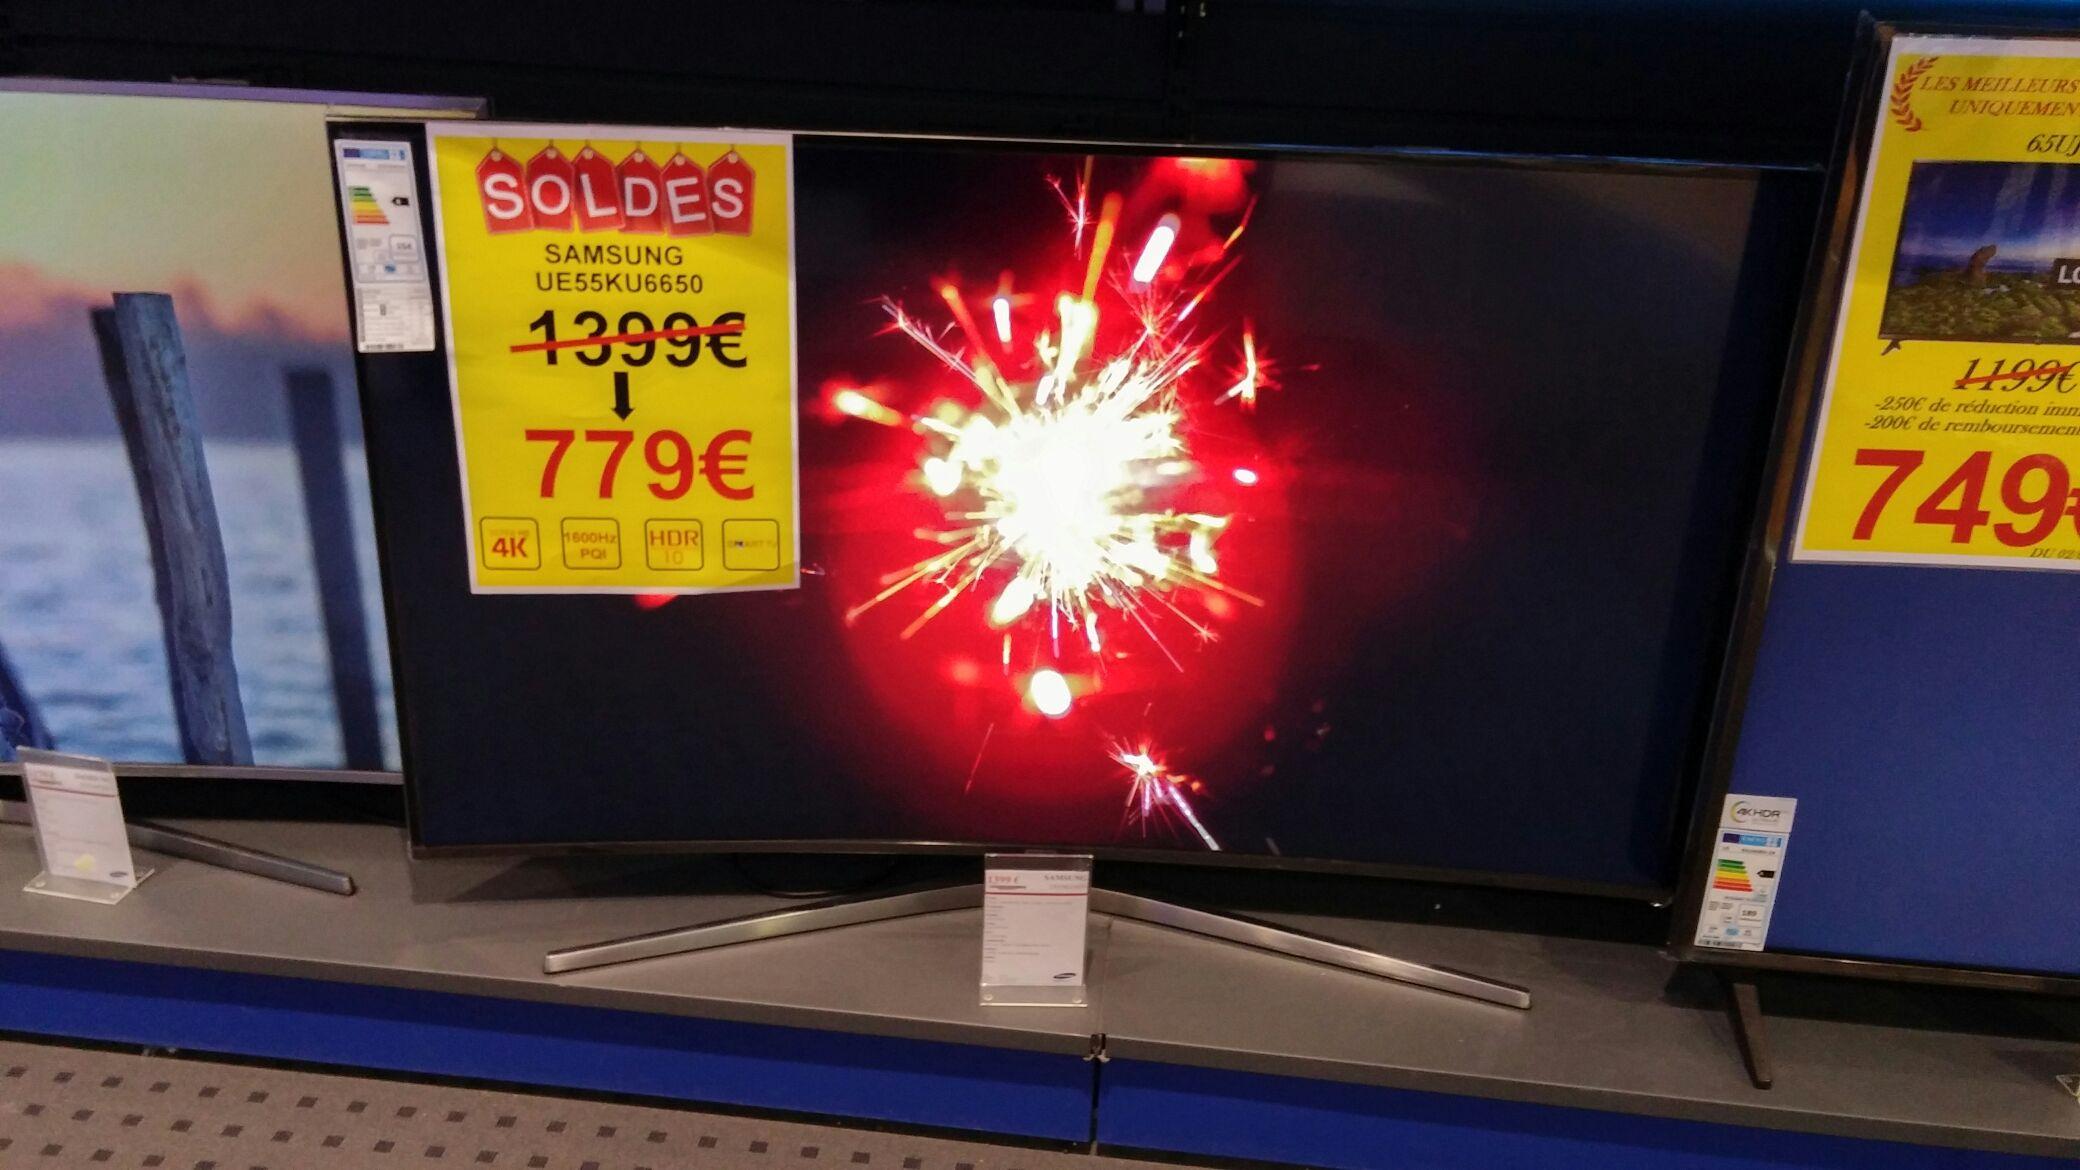 "TV 55"" Samsung UE55KU6650 - Moulins (03) centre culturel leclerc"